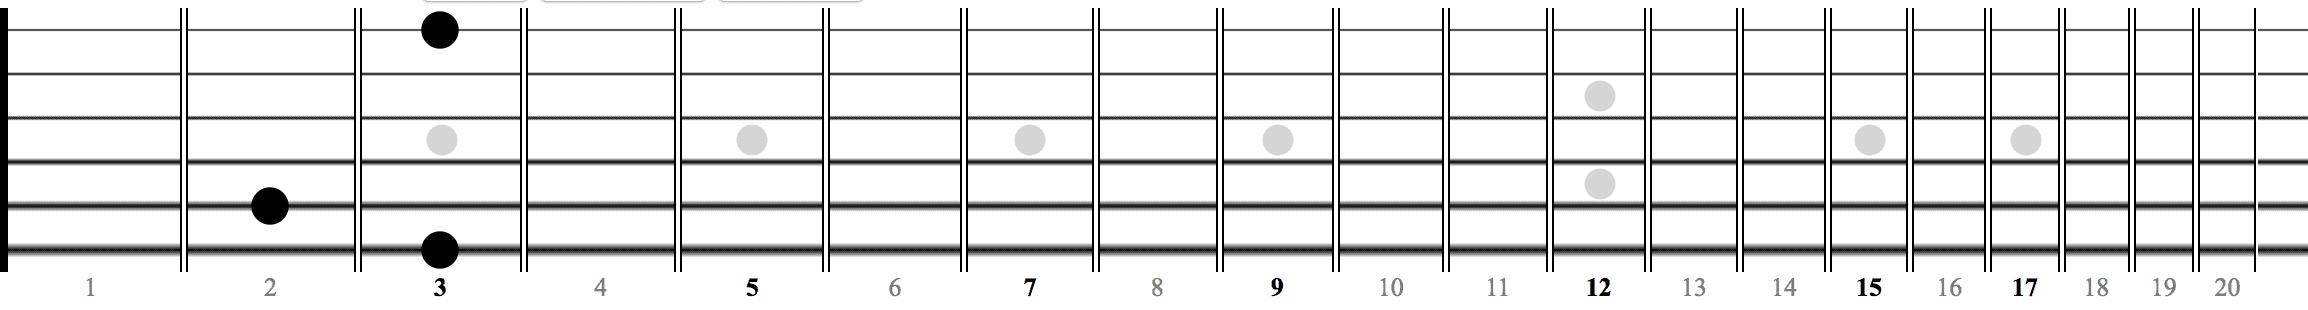 G major chord